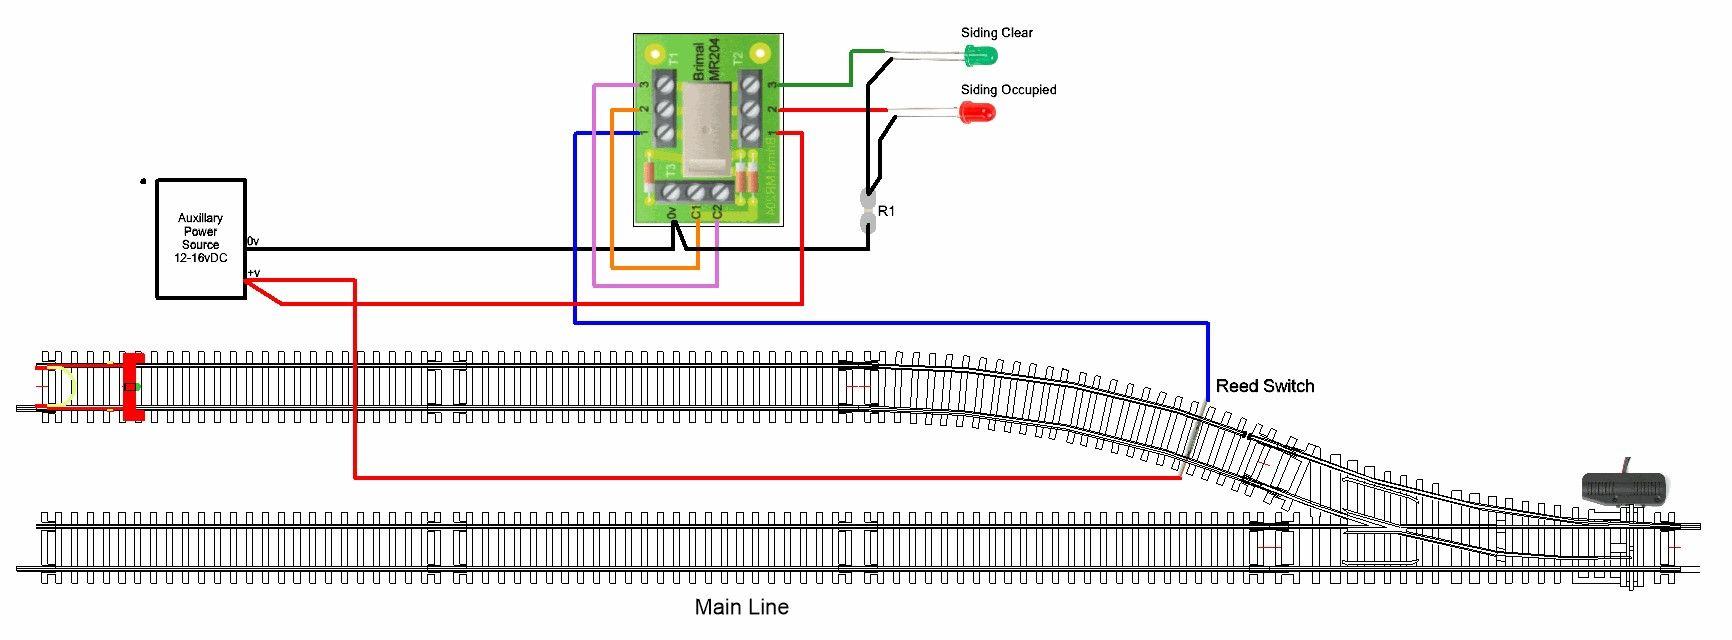 Power On Indicator Circuit